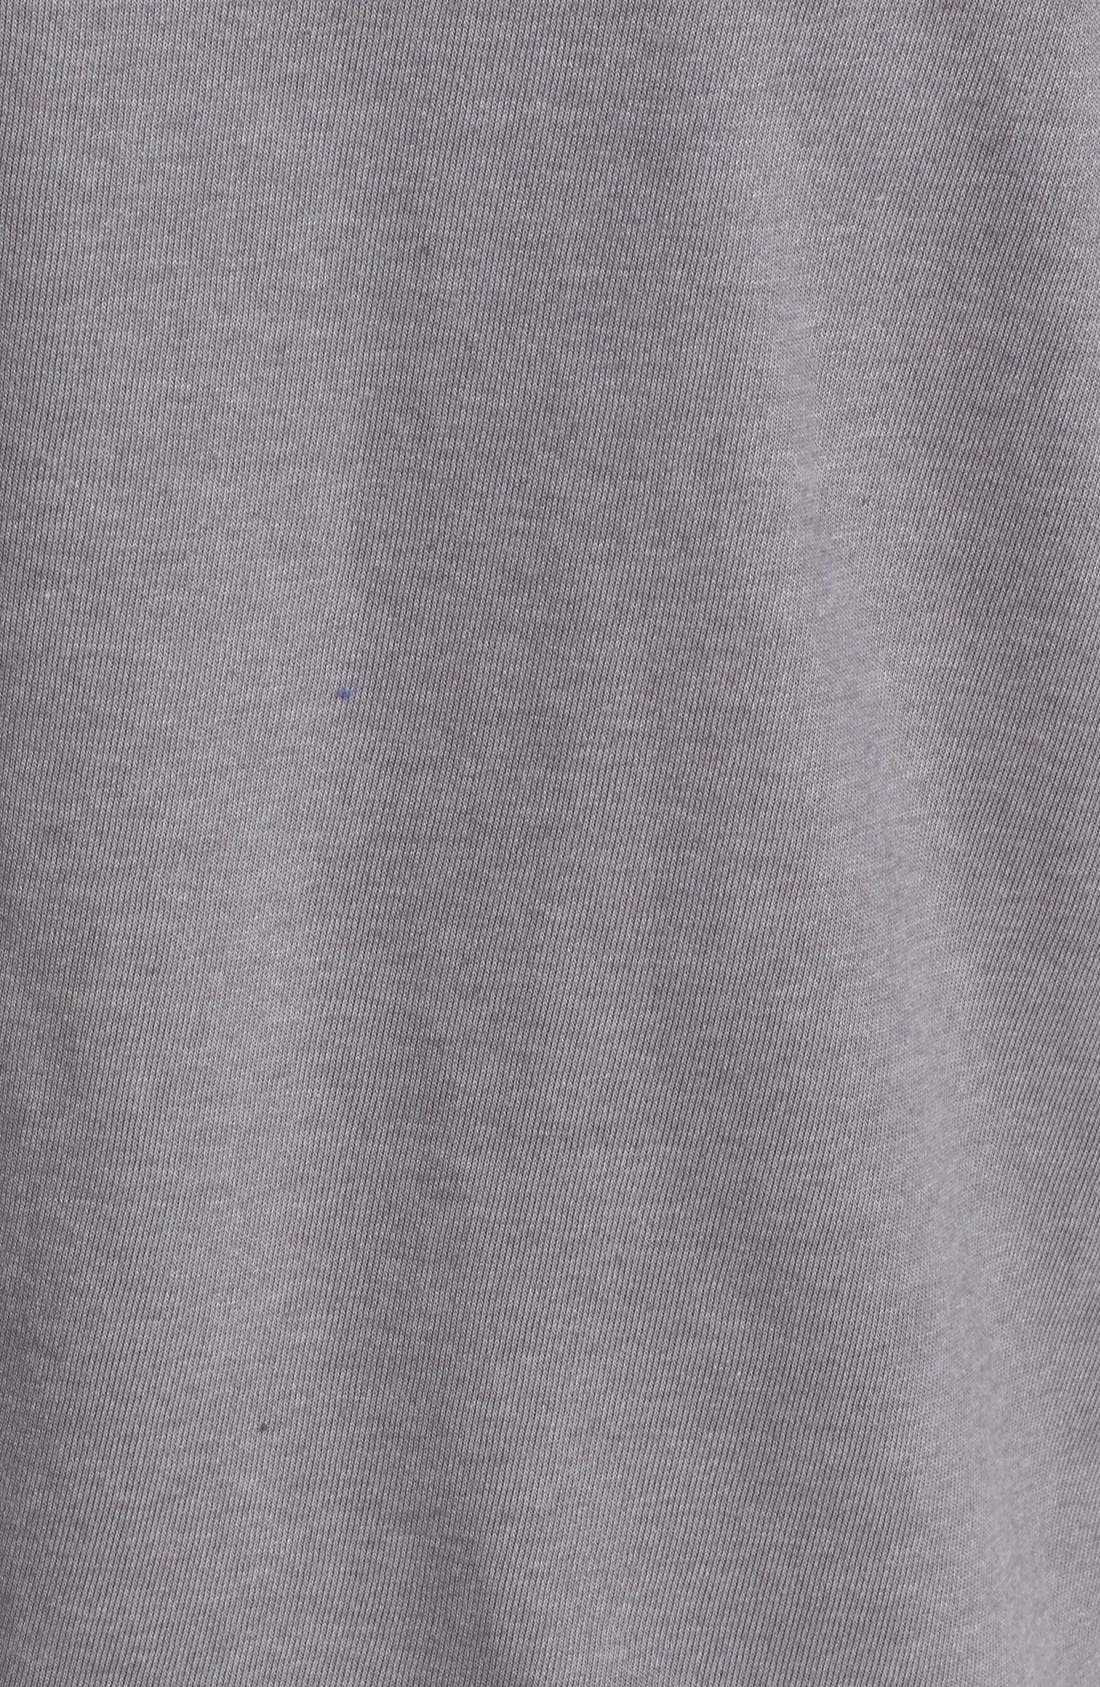 'Radarte' Foil Sweatshirt,                             Alternate thumbnail 3, color,                             022